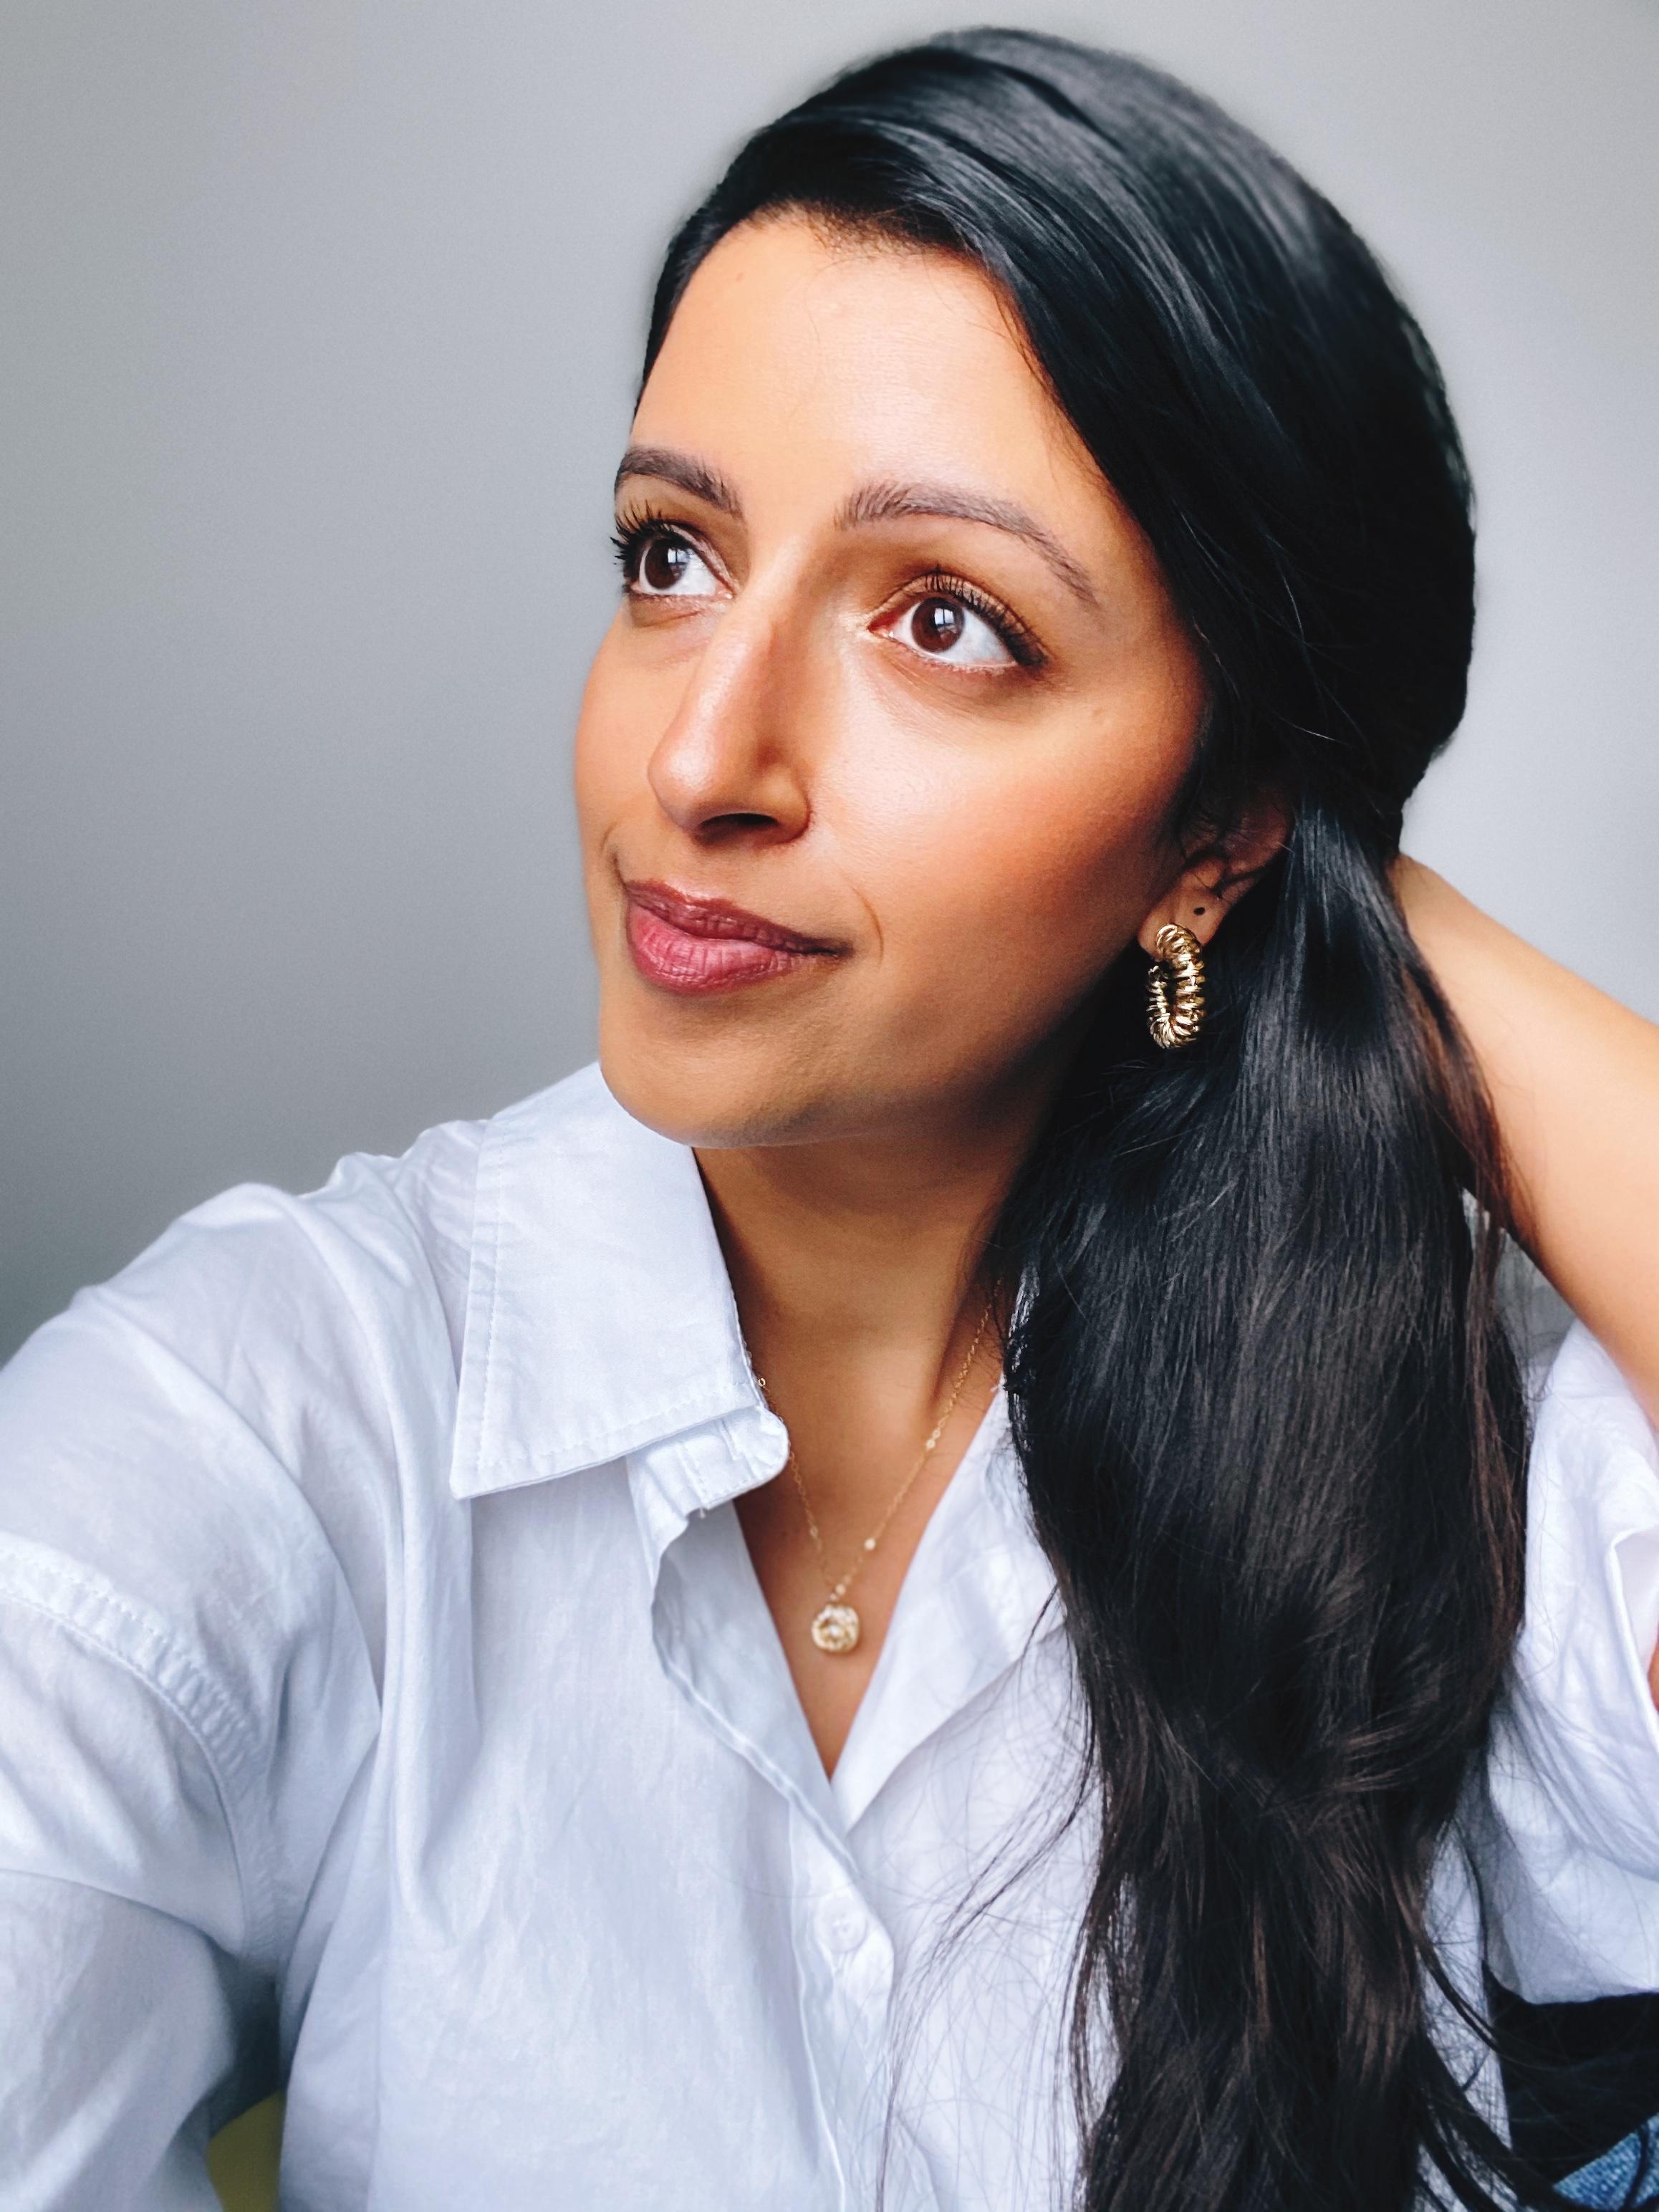 Shilpa Bhim - BIPOC Female Founder of Glowreel - Indian New Zealand Woman of Colour